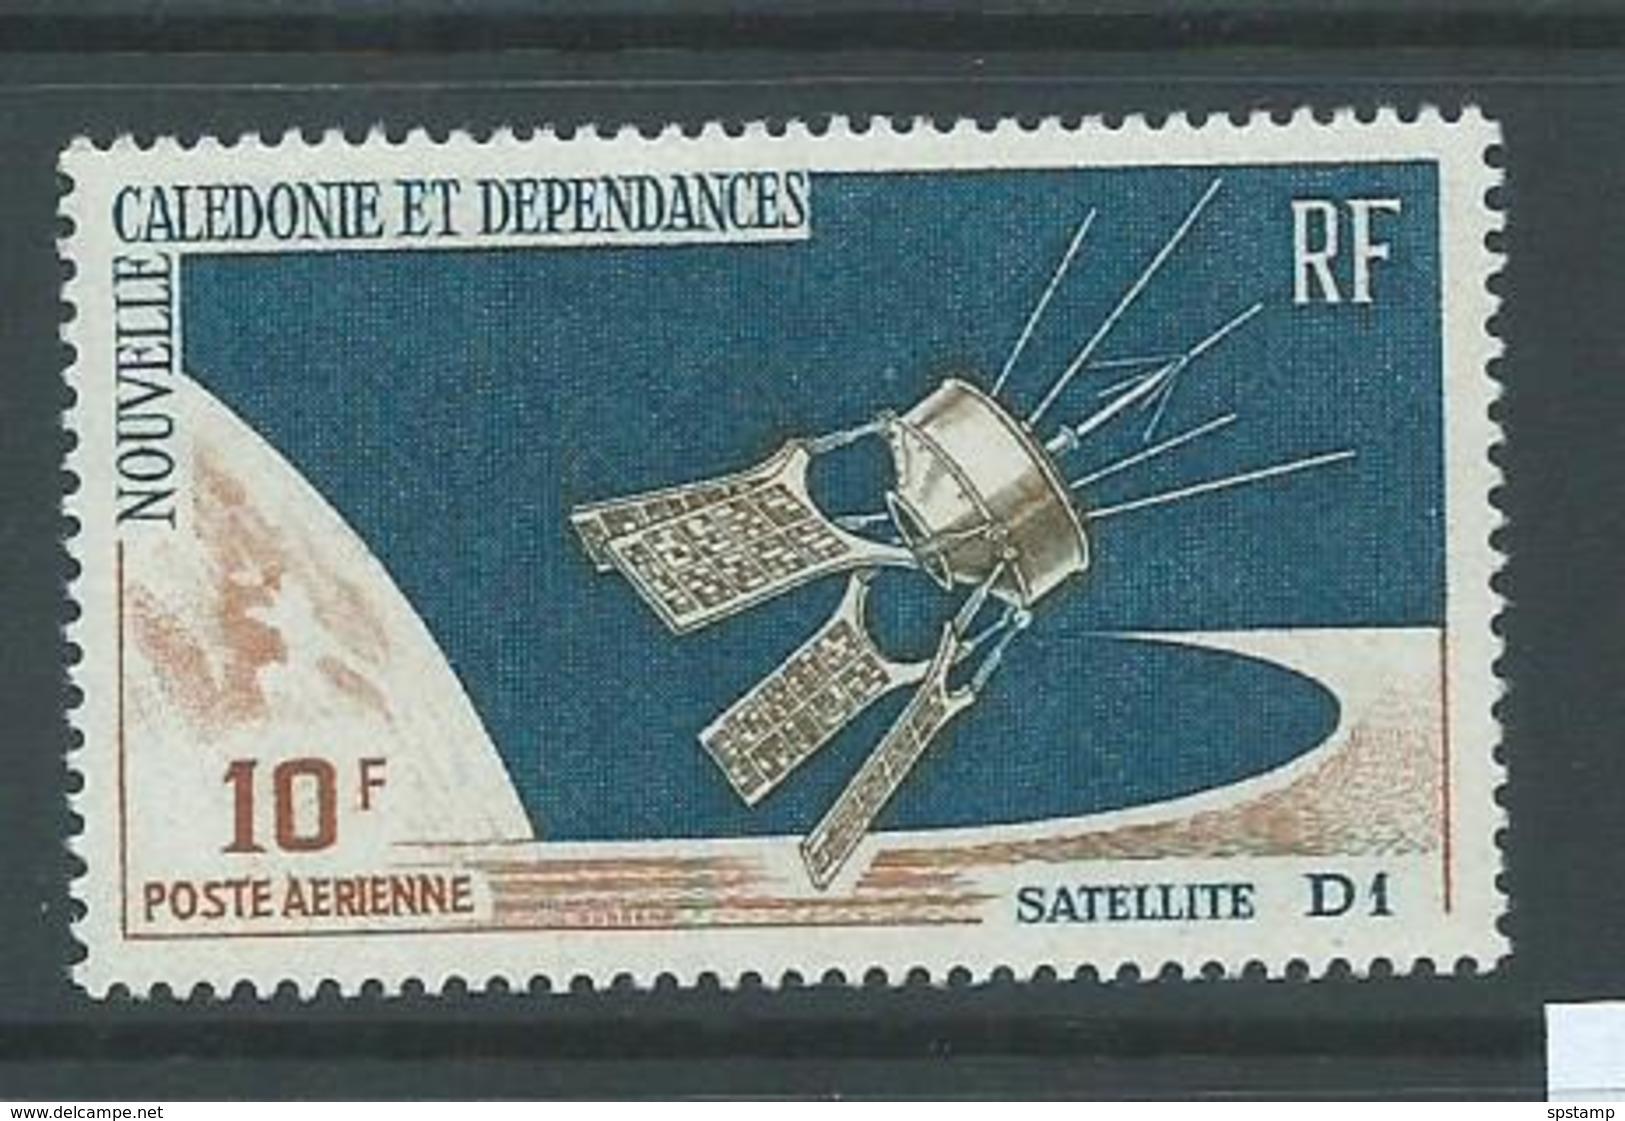 New Caledonia 1966 Satellite 10 F Airmail Single MNH - Unused Stamps